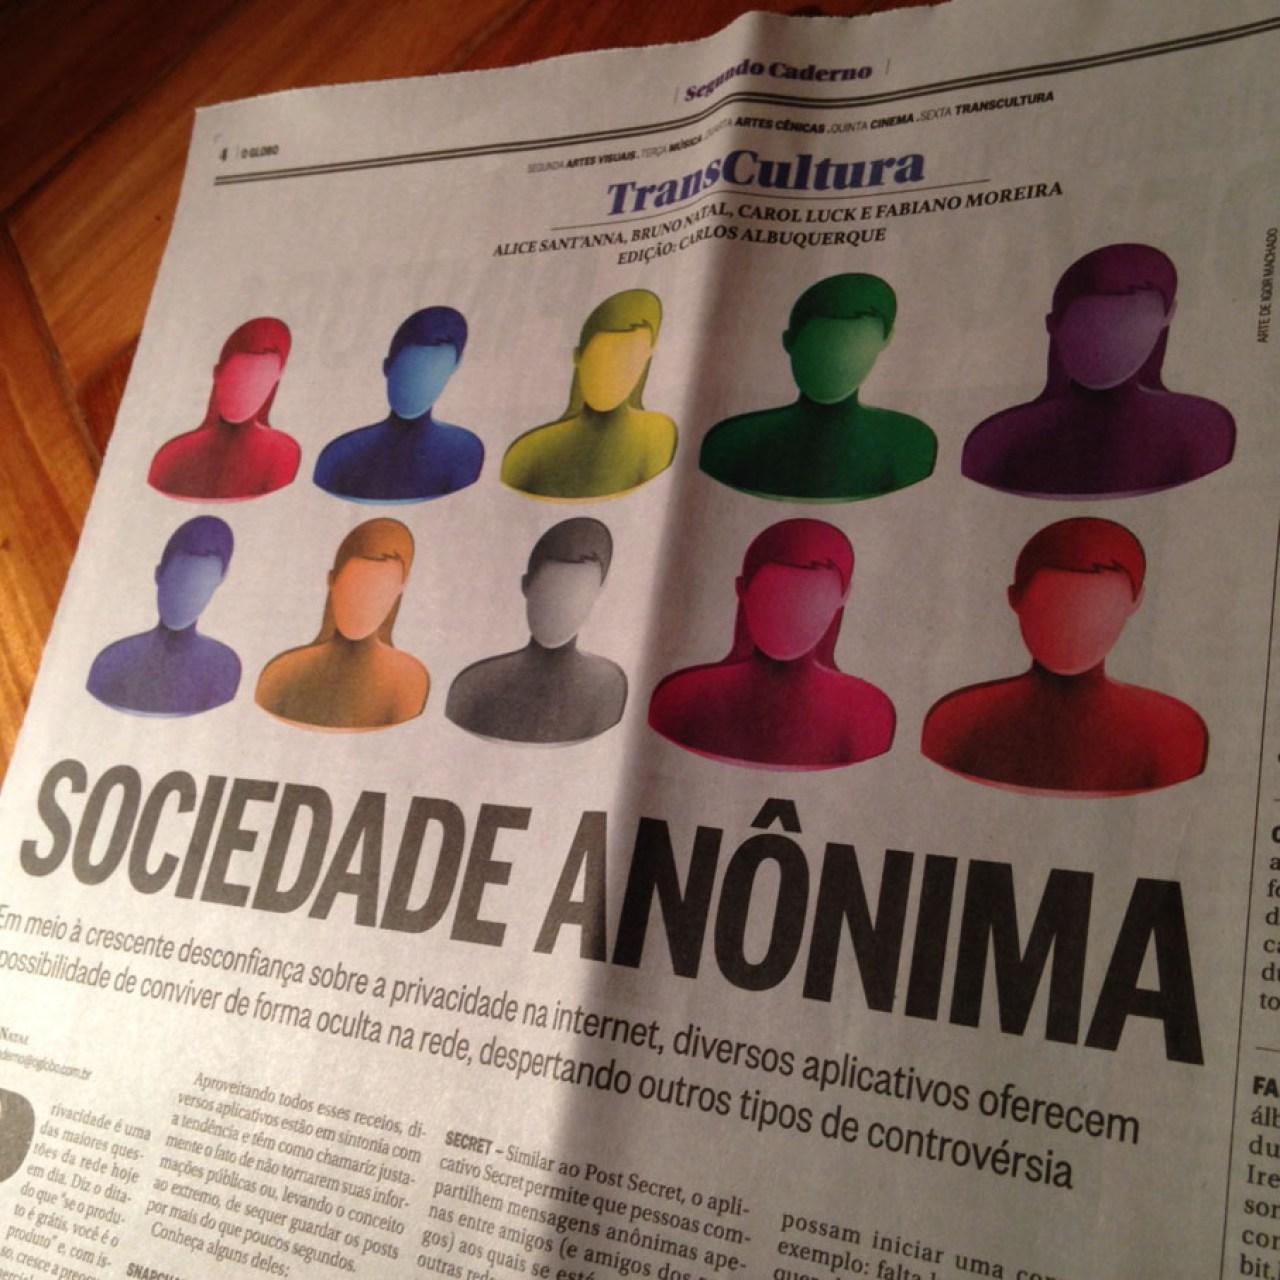 transcultura_oglobo_sociedadeanonima